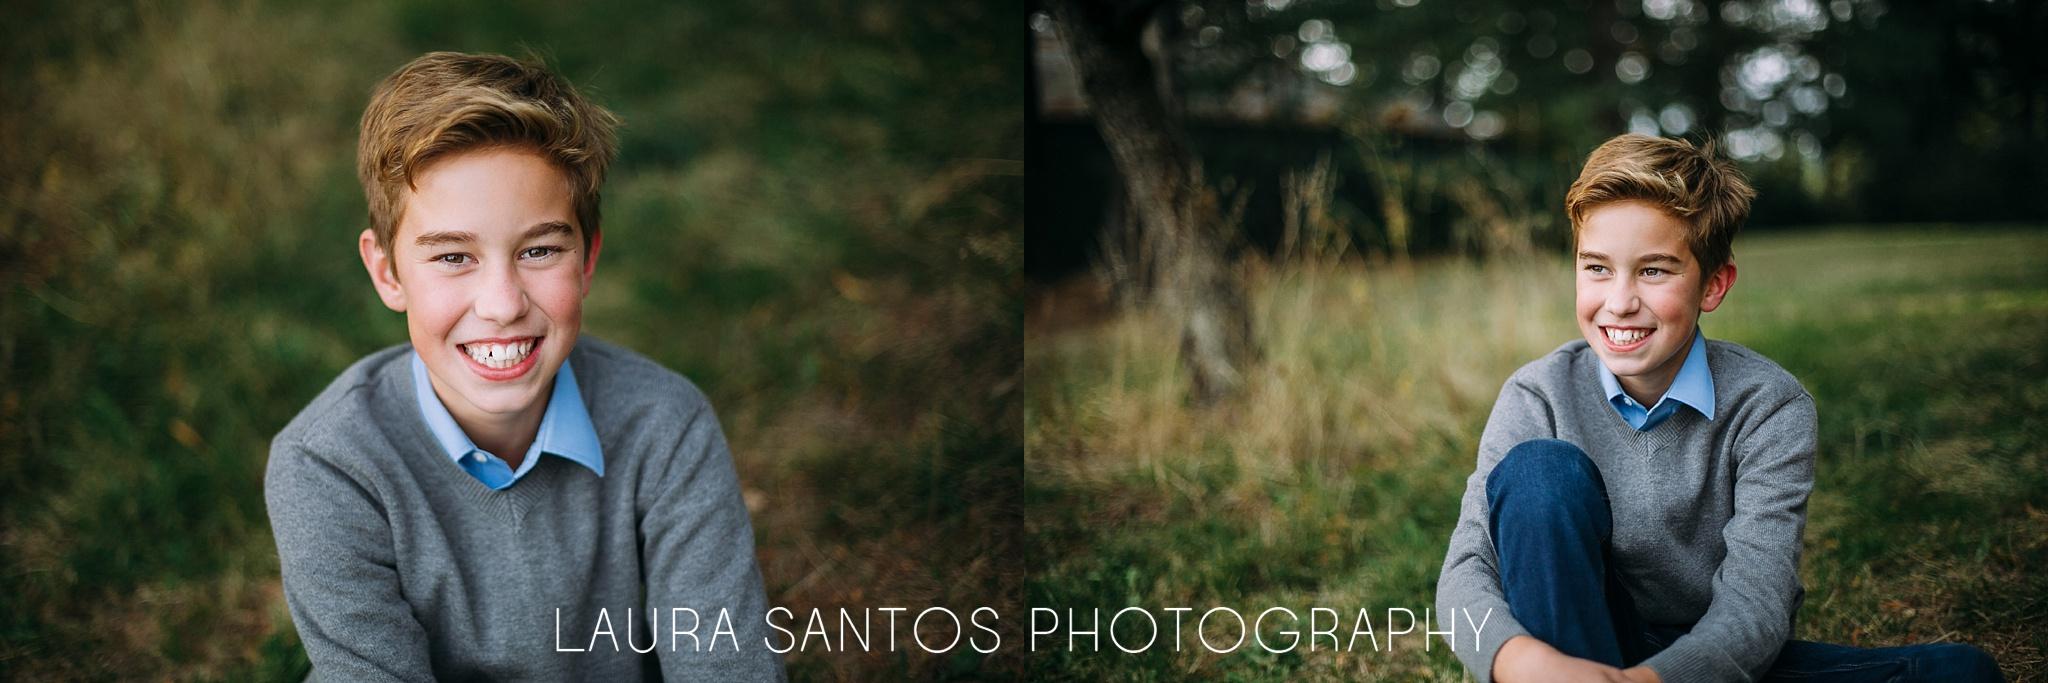 Laura Santos Photography Portland Oregon Family Photographer_0388.jpg